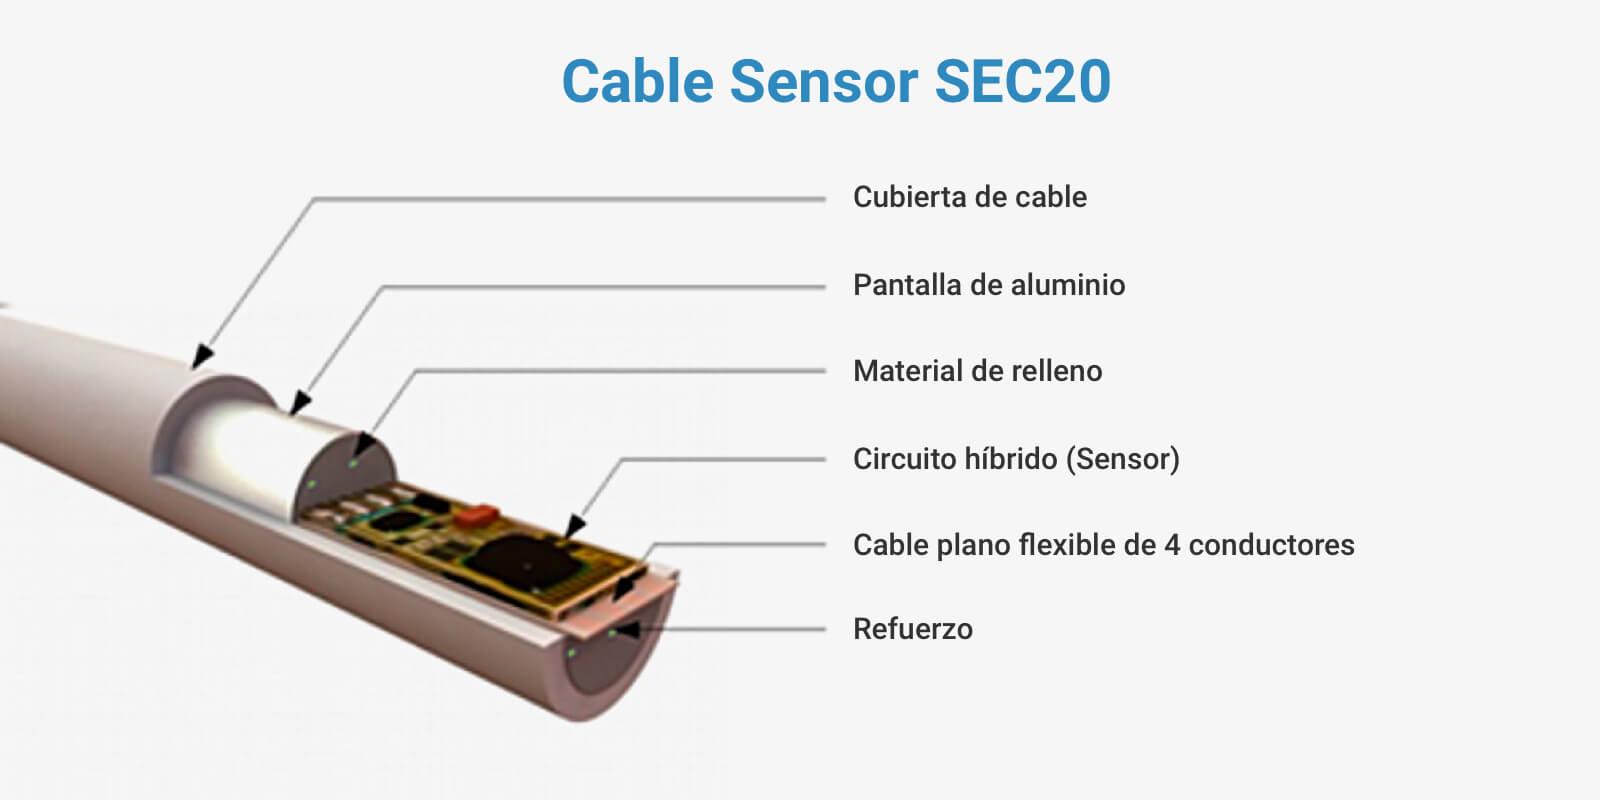 Cable sensor SE20